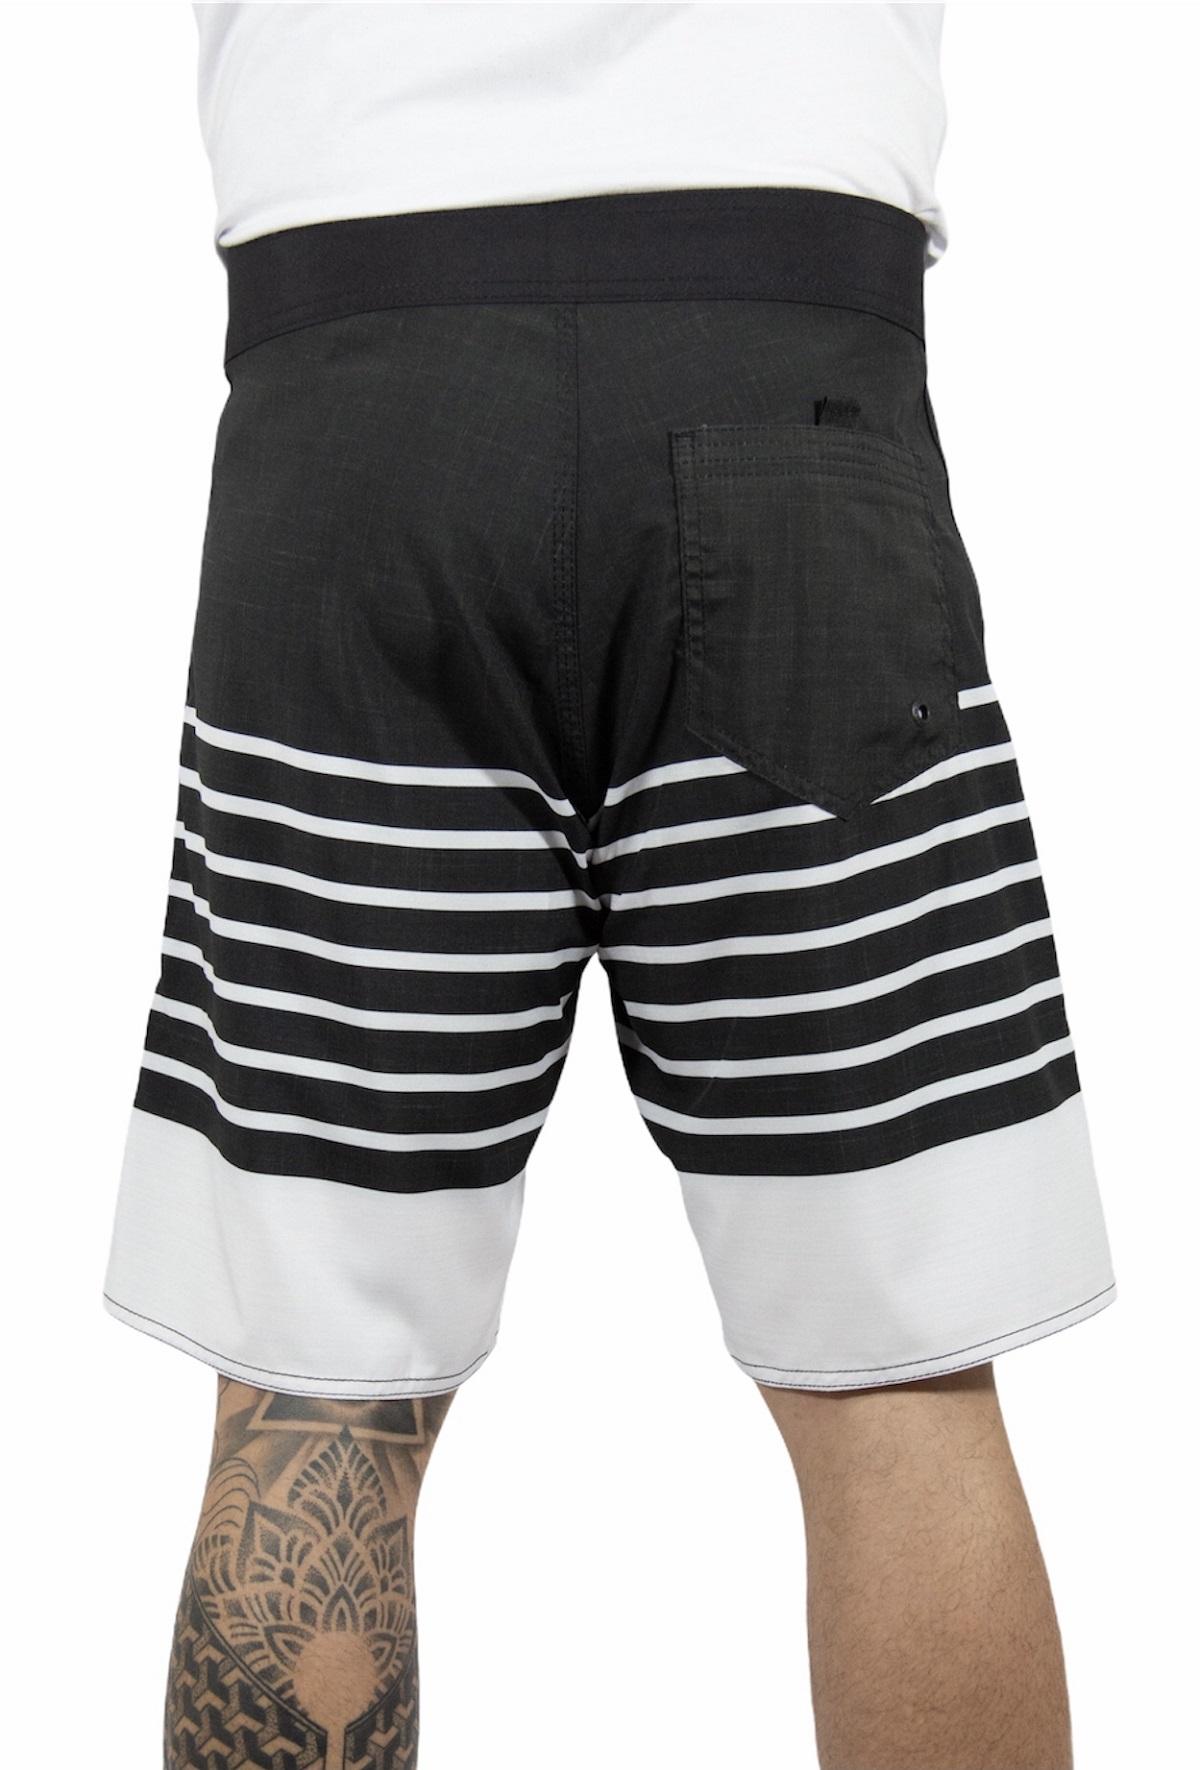 Boardshort Maza Limits